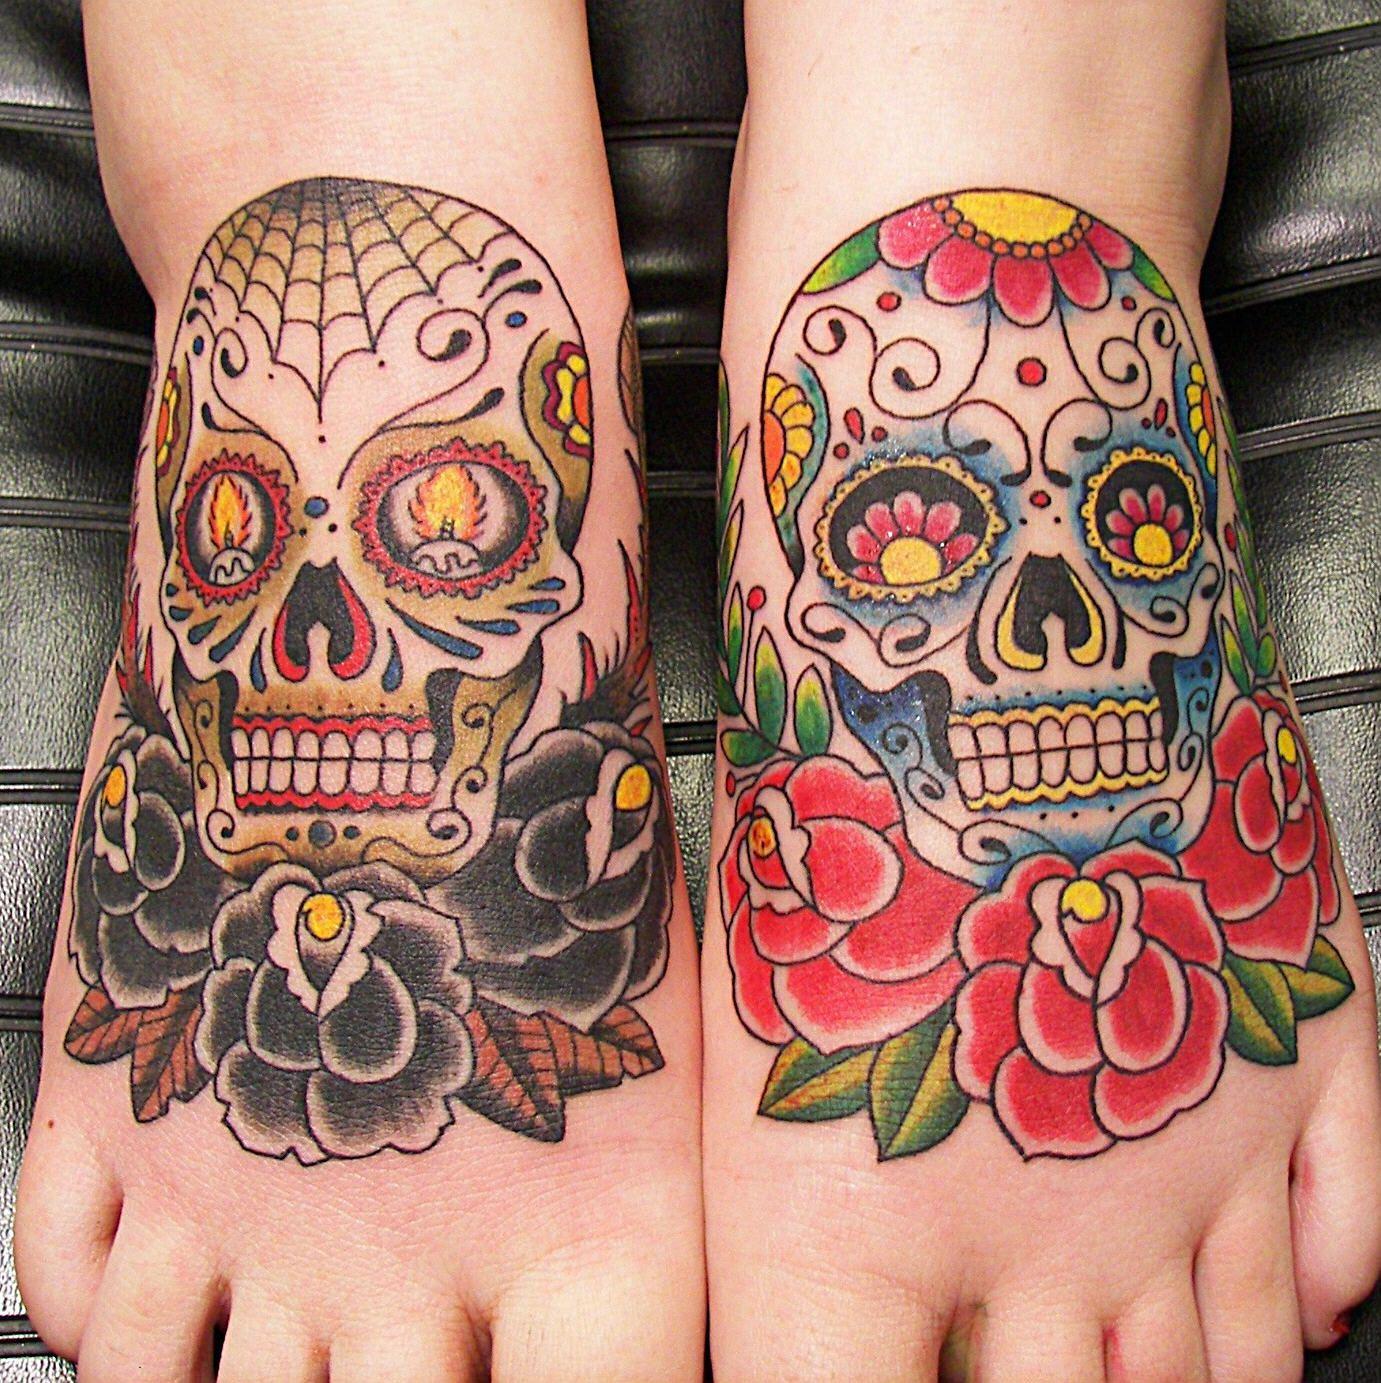 Sweet Sugar Skulls Candy Skull Tattoo Day Of The Dead Skull Tattoo Mexican Skull Tattoos